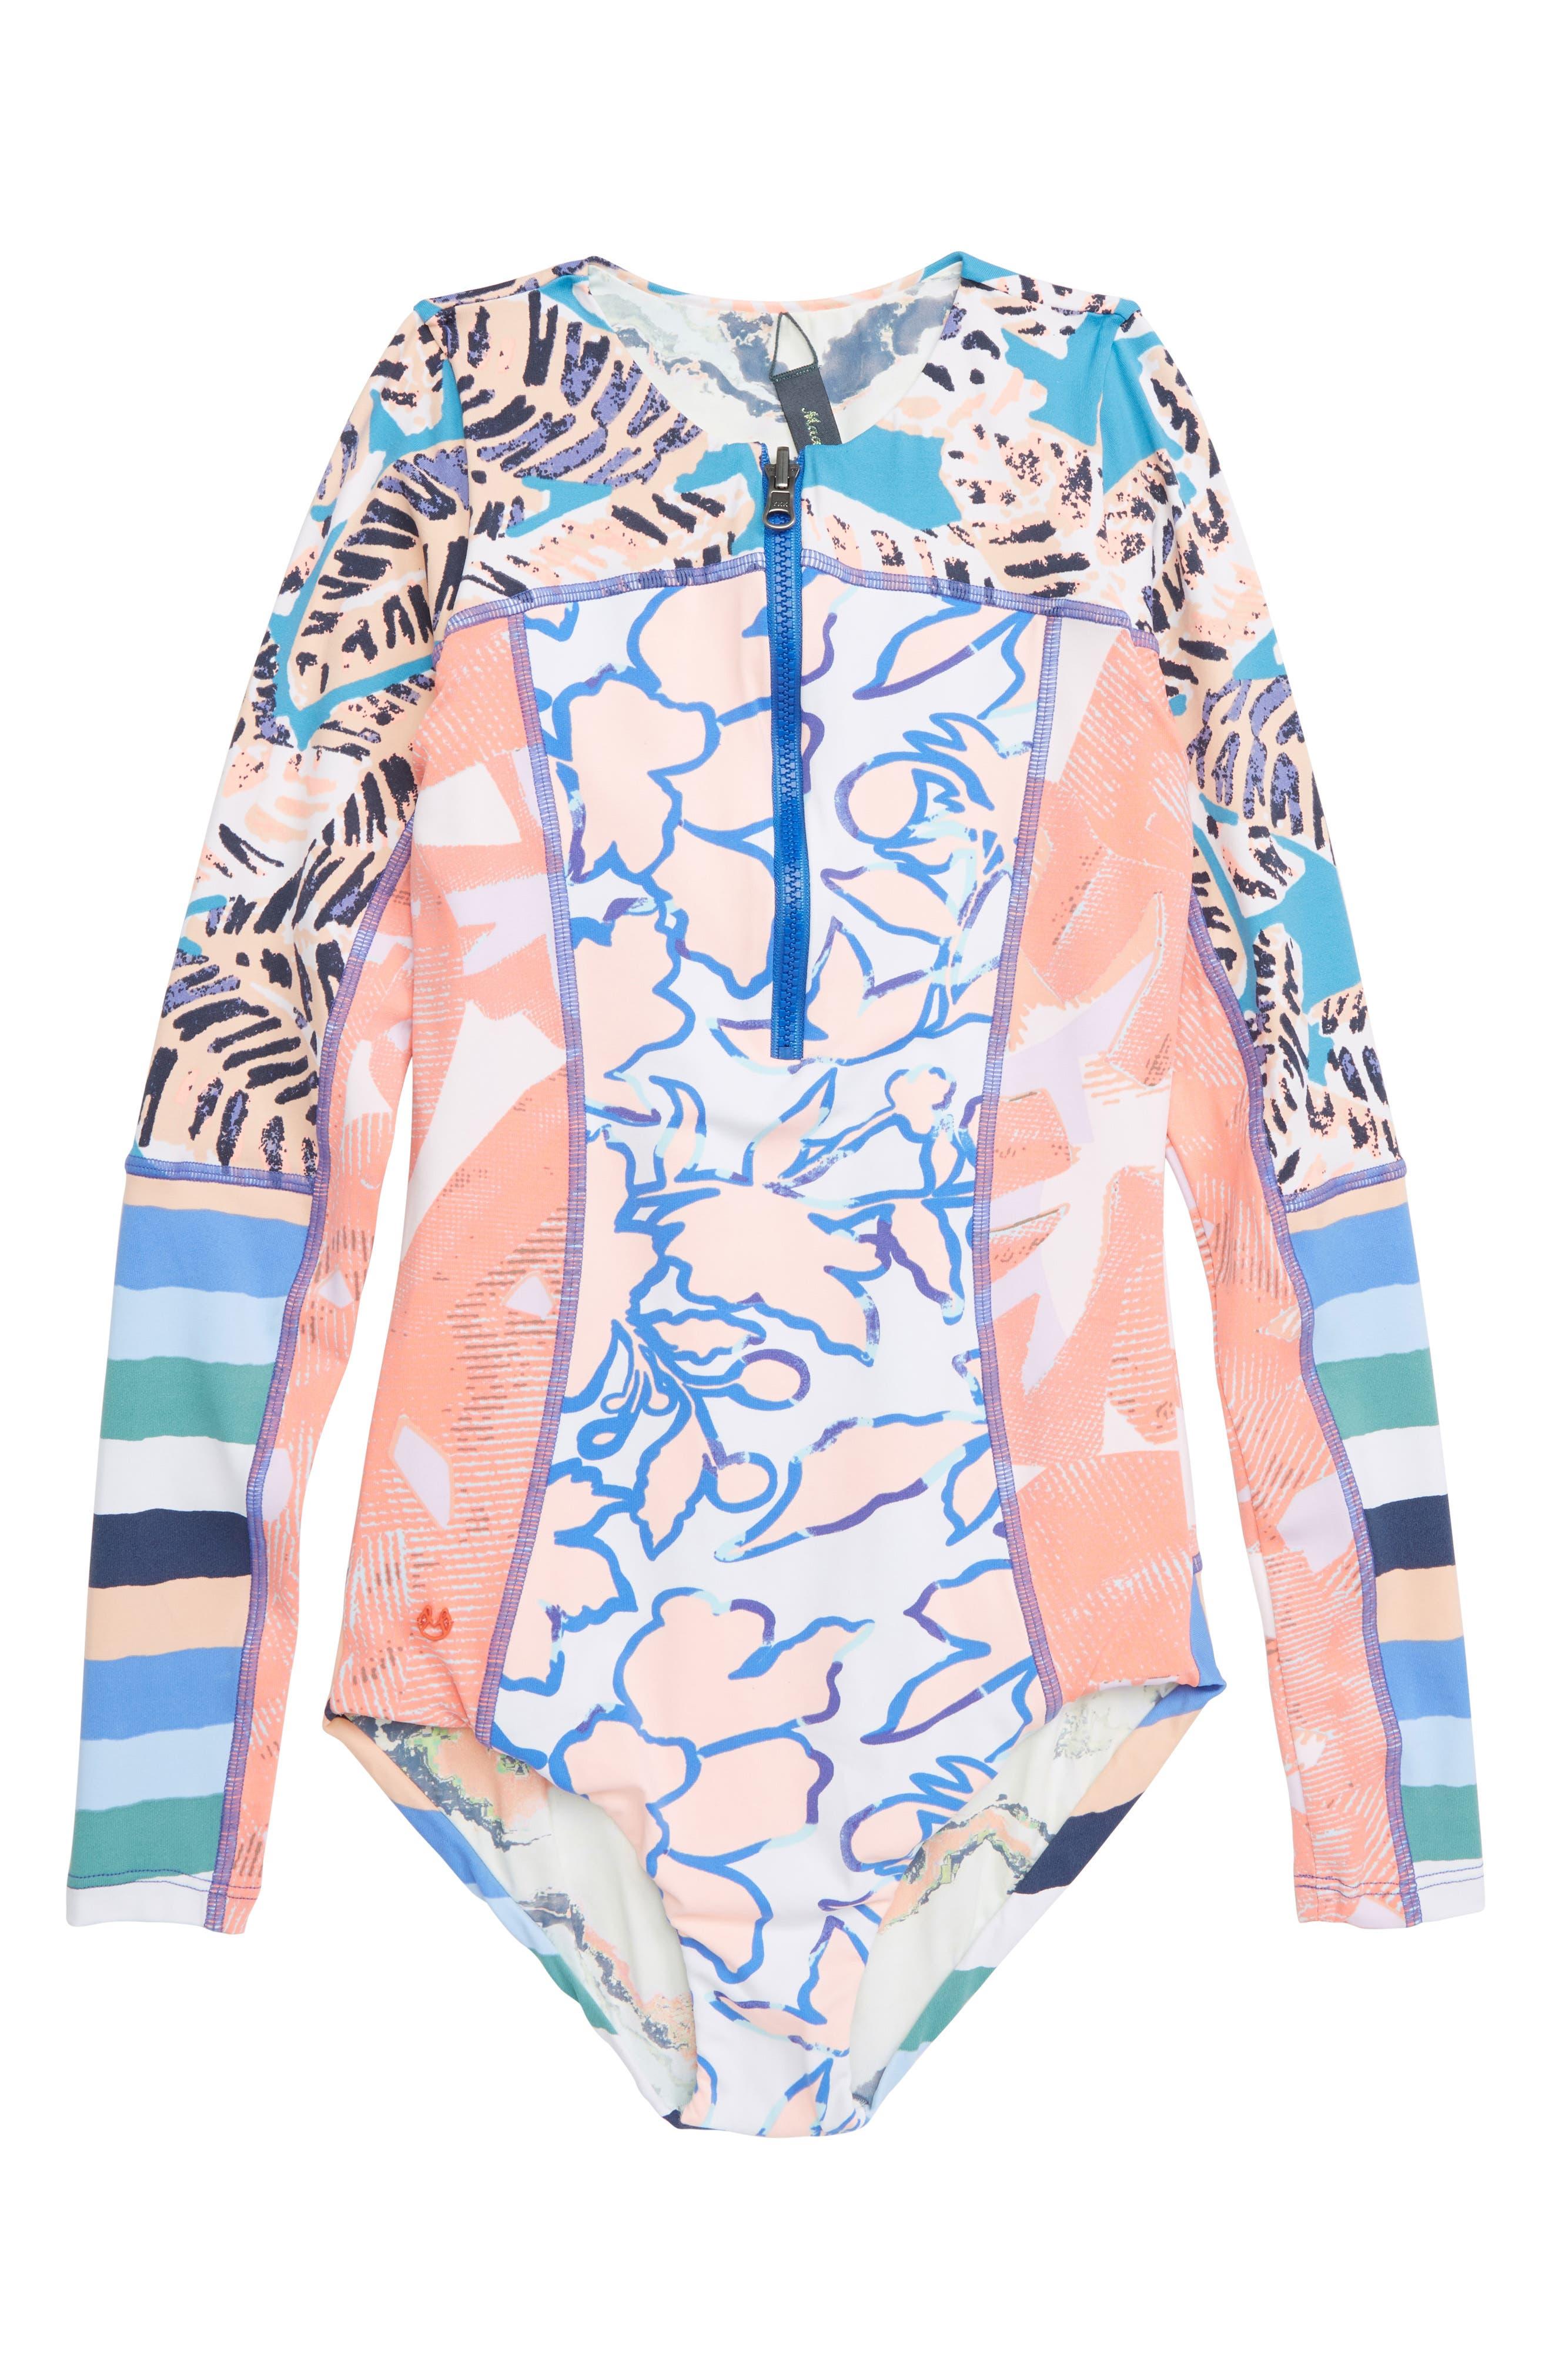 Ocean Joiness Reversible One-Piece Rashguard Swimsuit, Main, color, MULTICOLOR